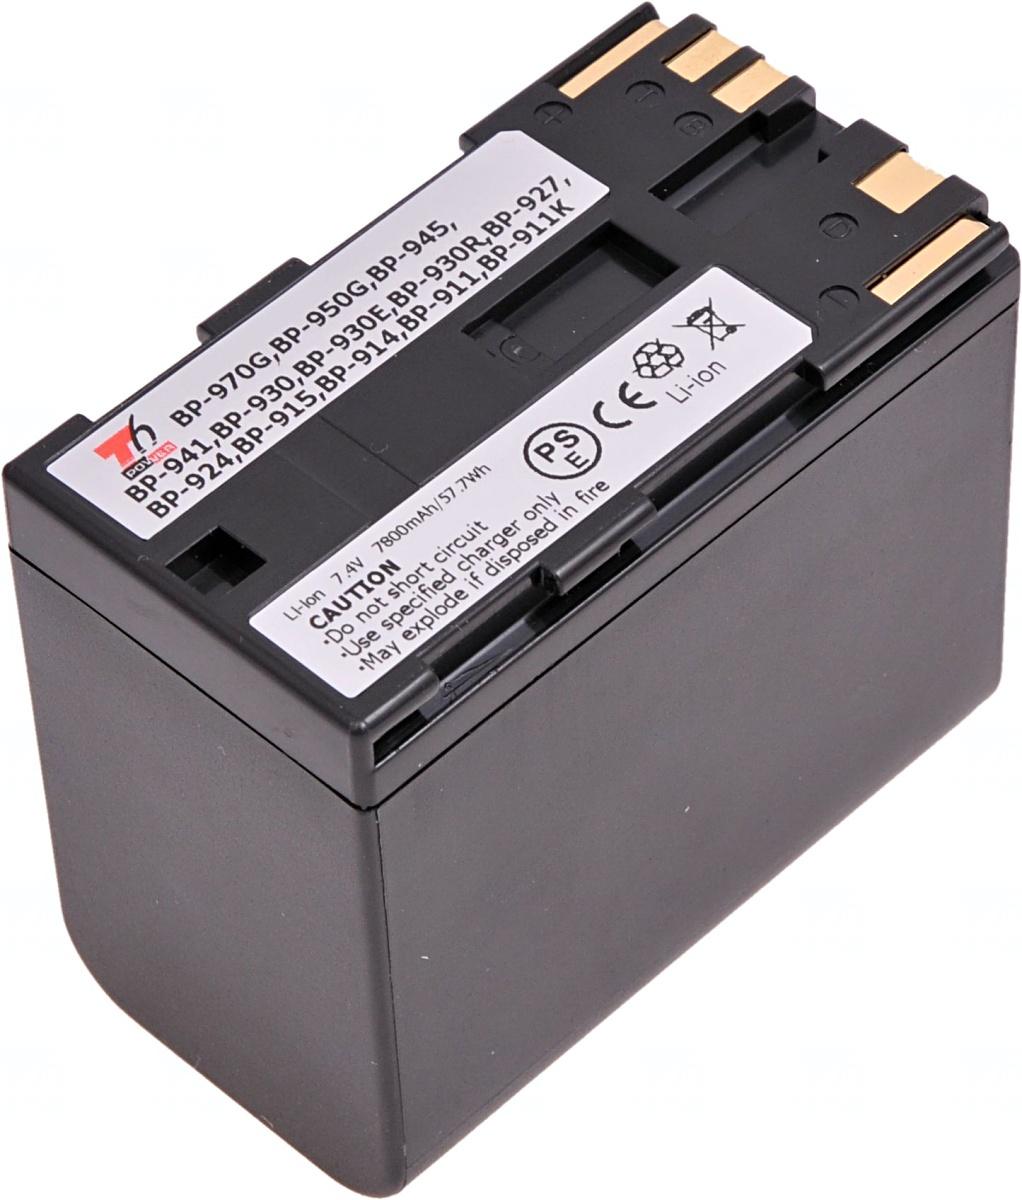 Baterie T6 power Canon BP-911, BP-914, BP-930, BP-945, BP-950, BP-955, BP-970, BP-975, 7800mAh